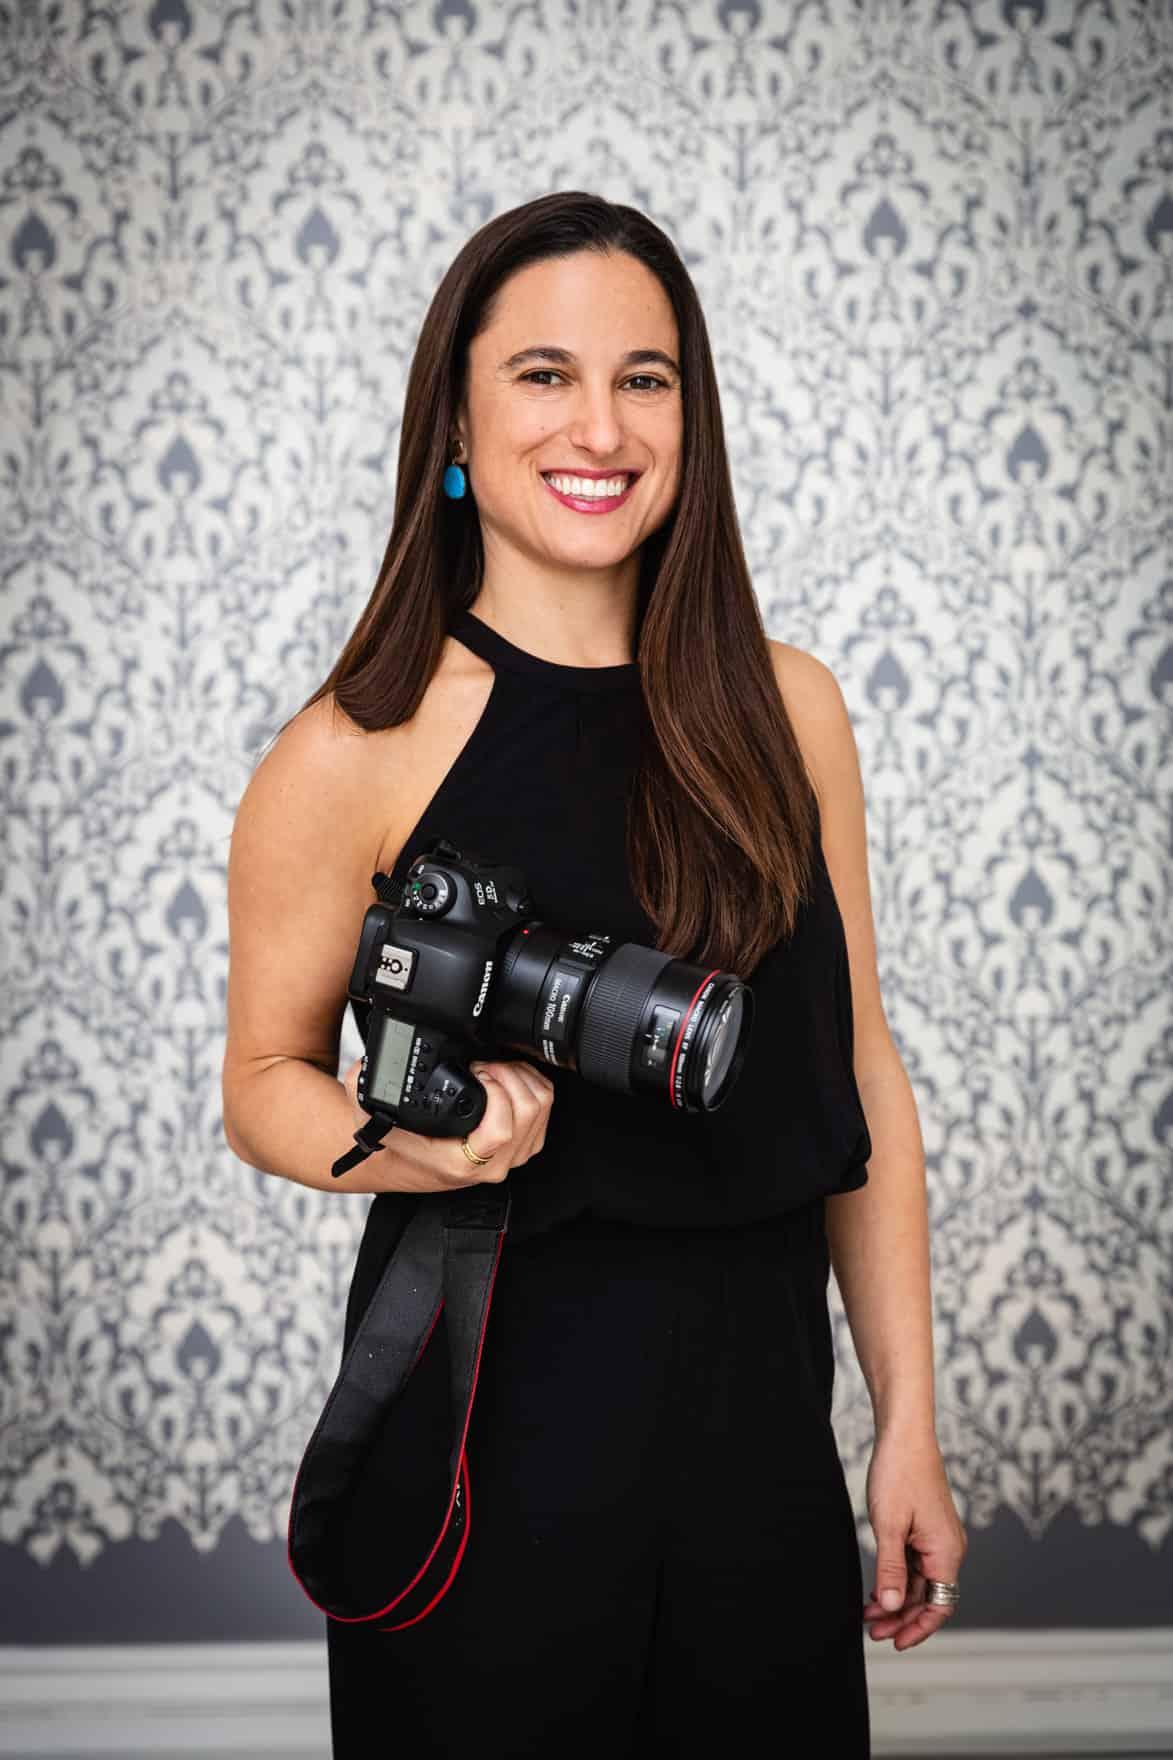 Chef Daniela Gerson holding her camera.